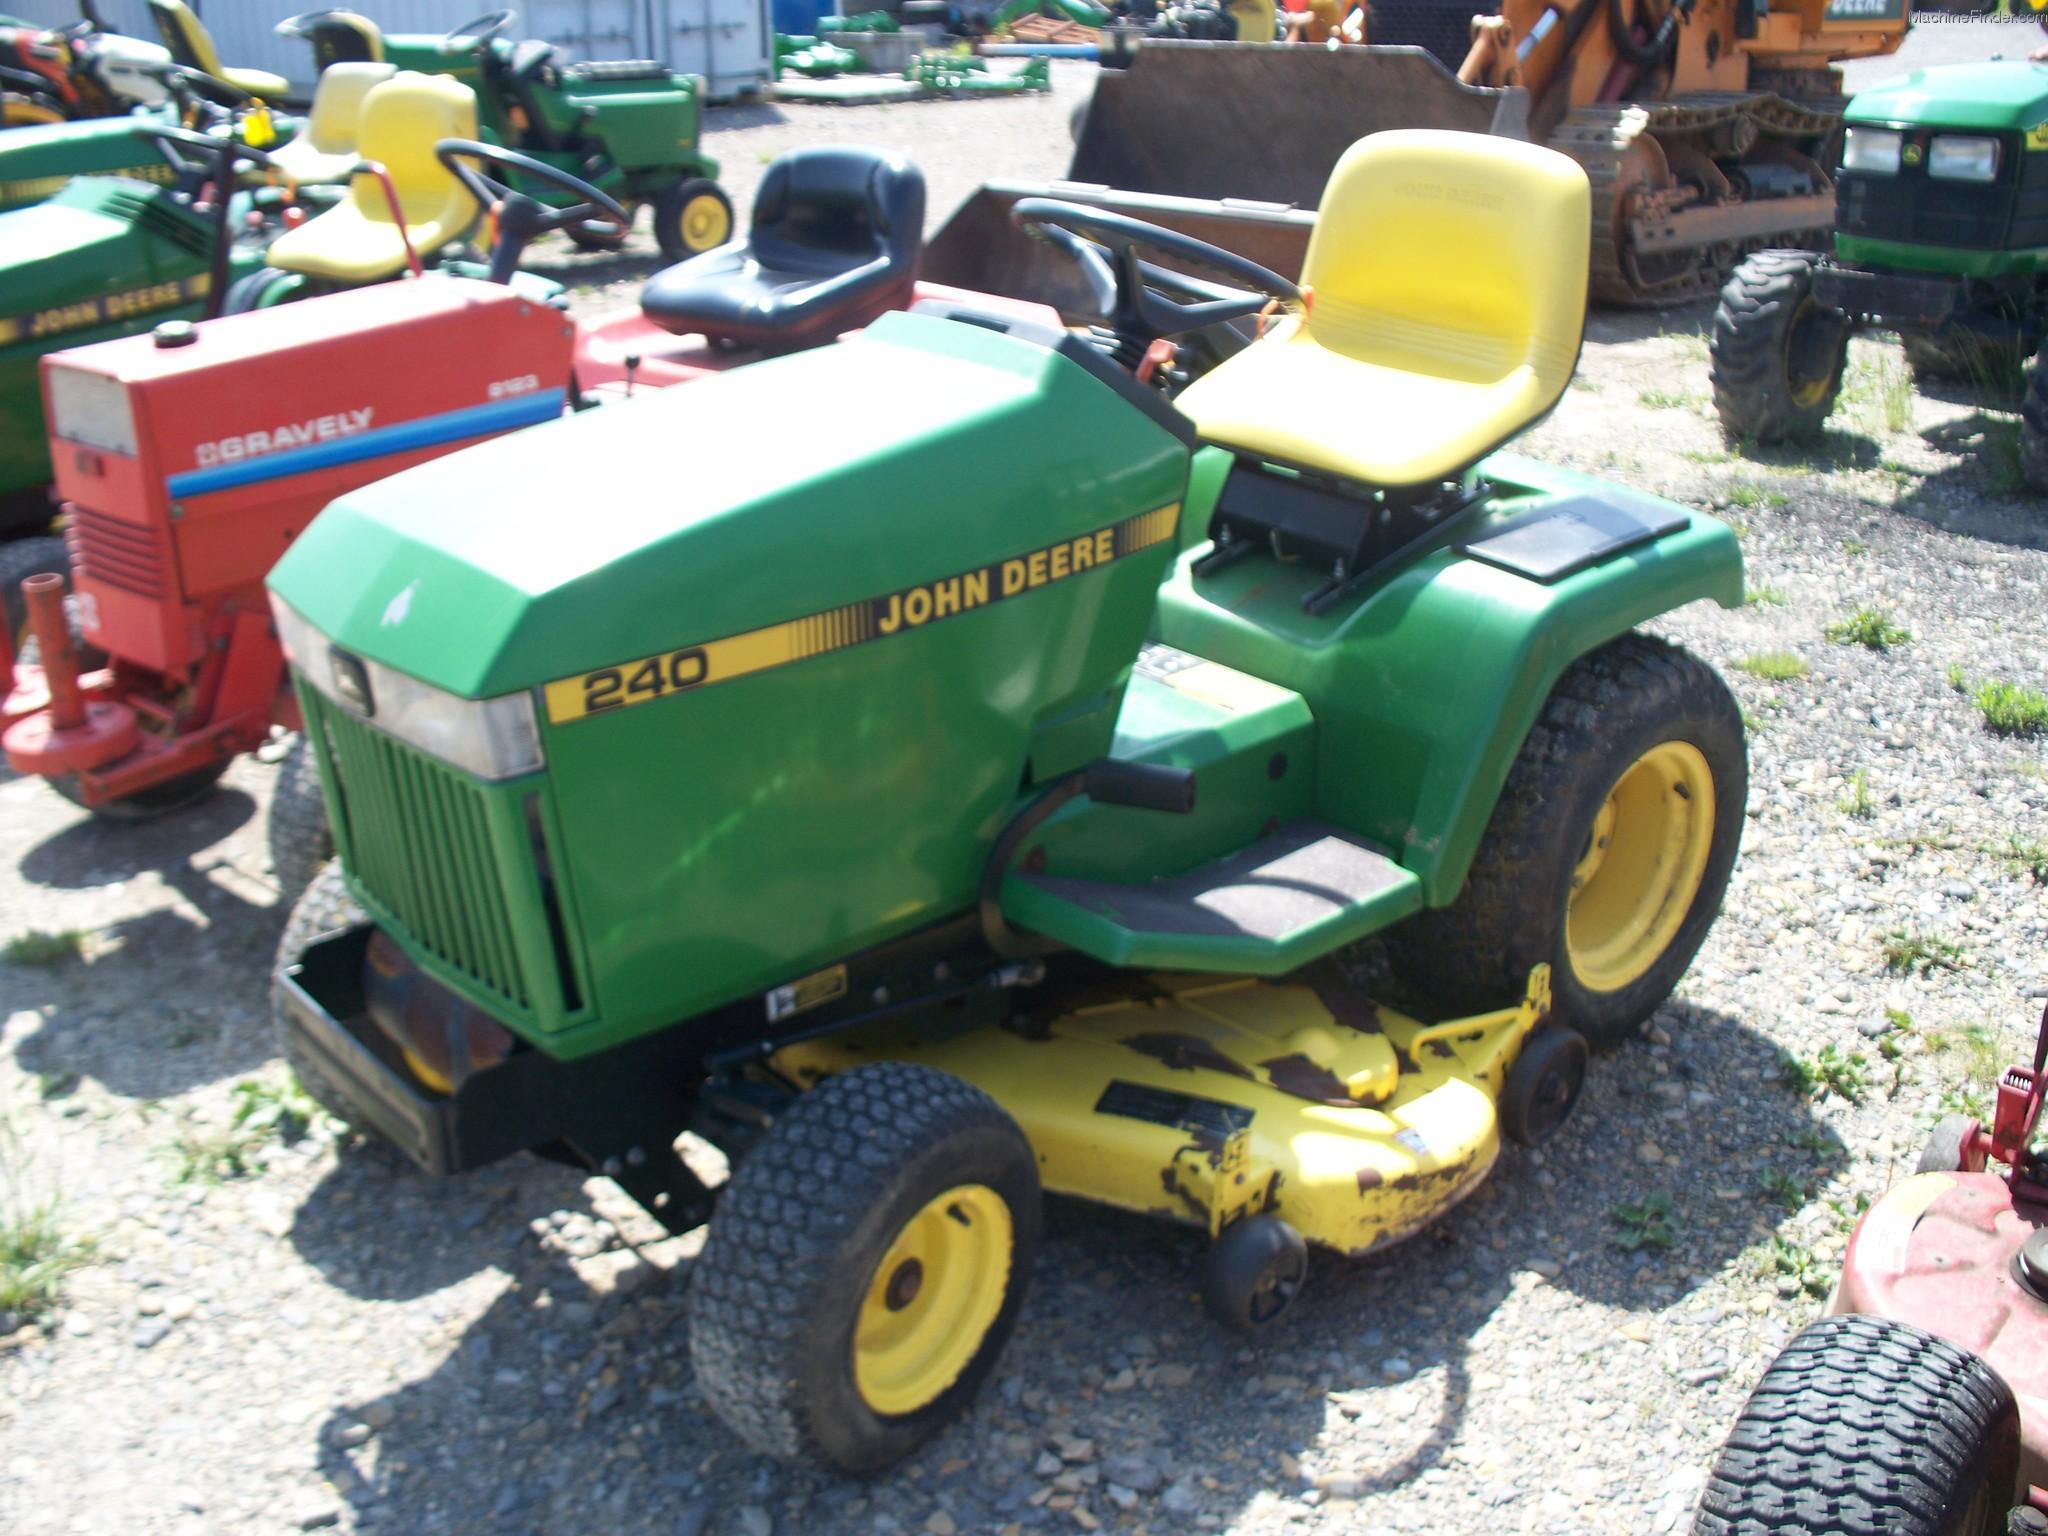 John Deere 240 Lawn Tractor : John deere lawn garden and commercial mowing